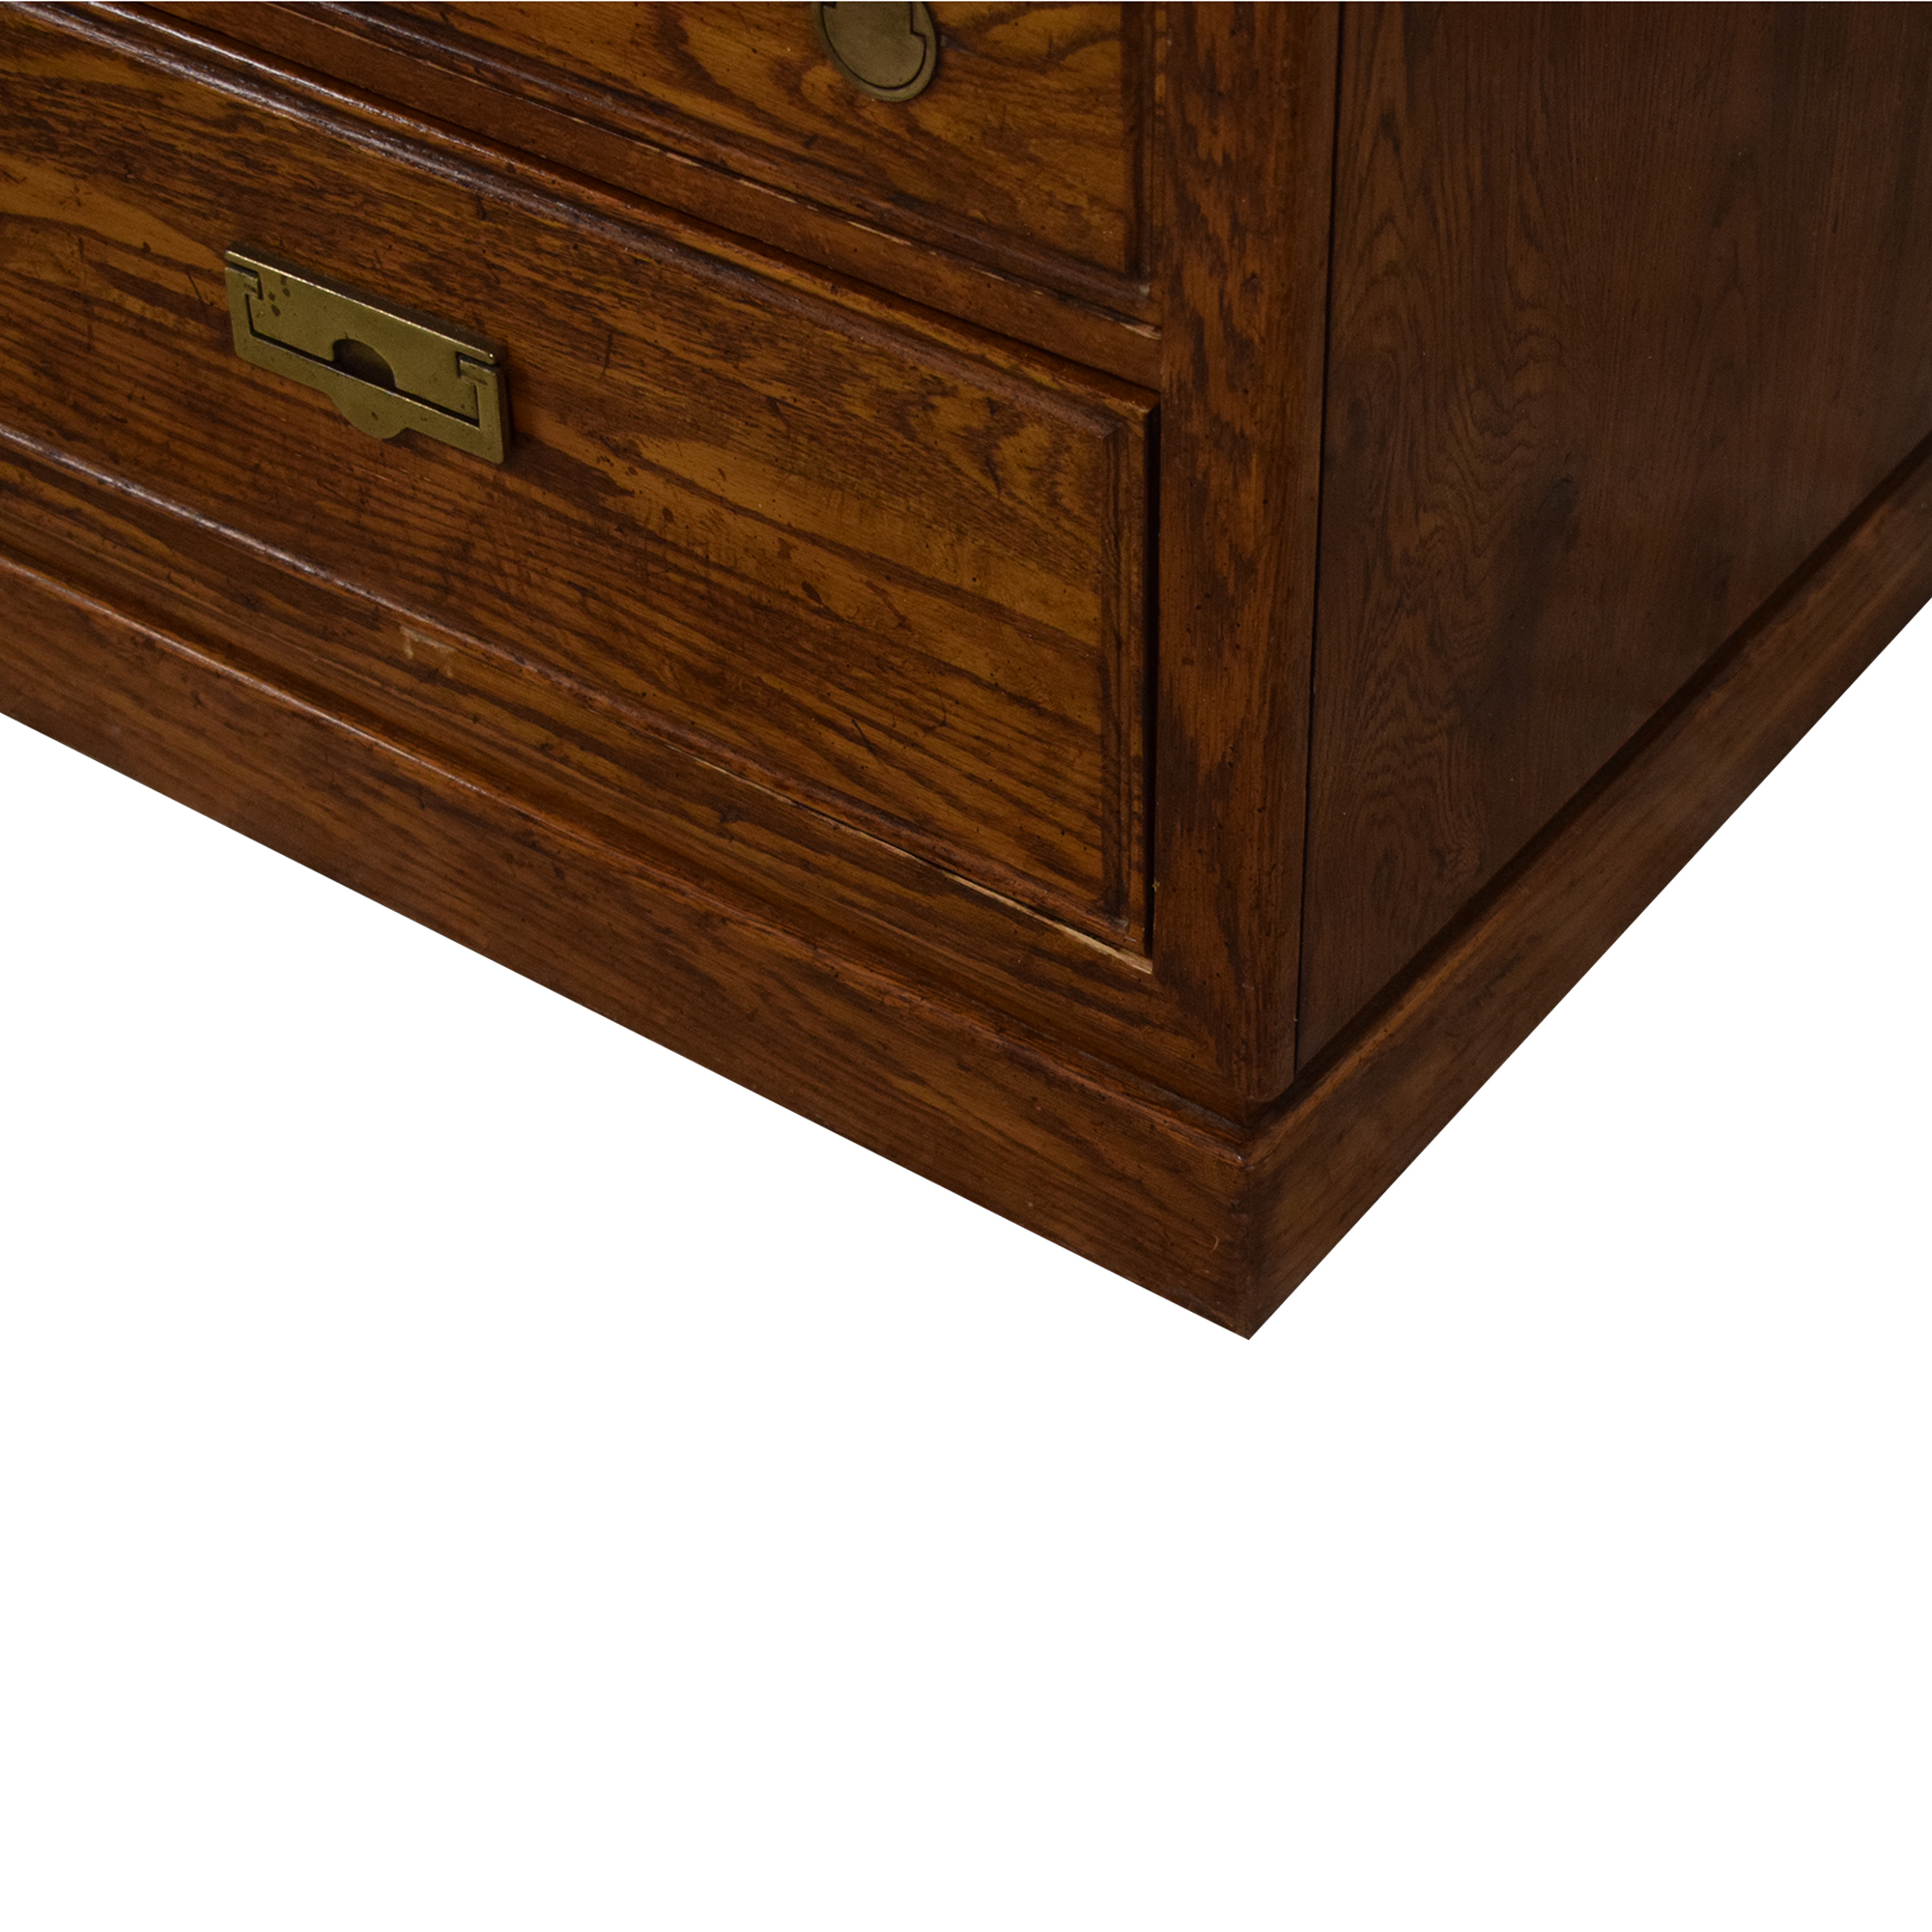 Thomasville Thomasville Vintage Dresser nj